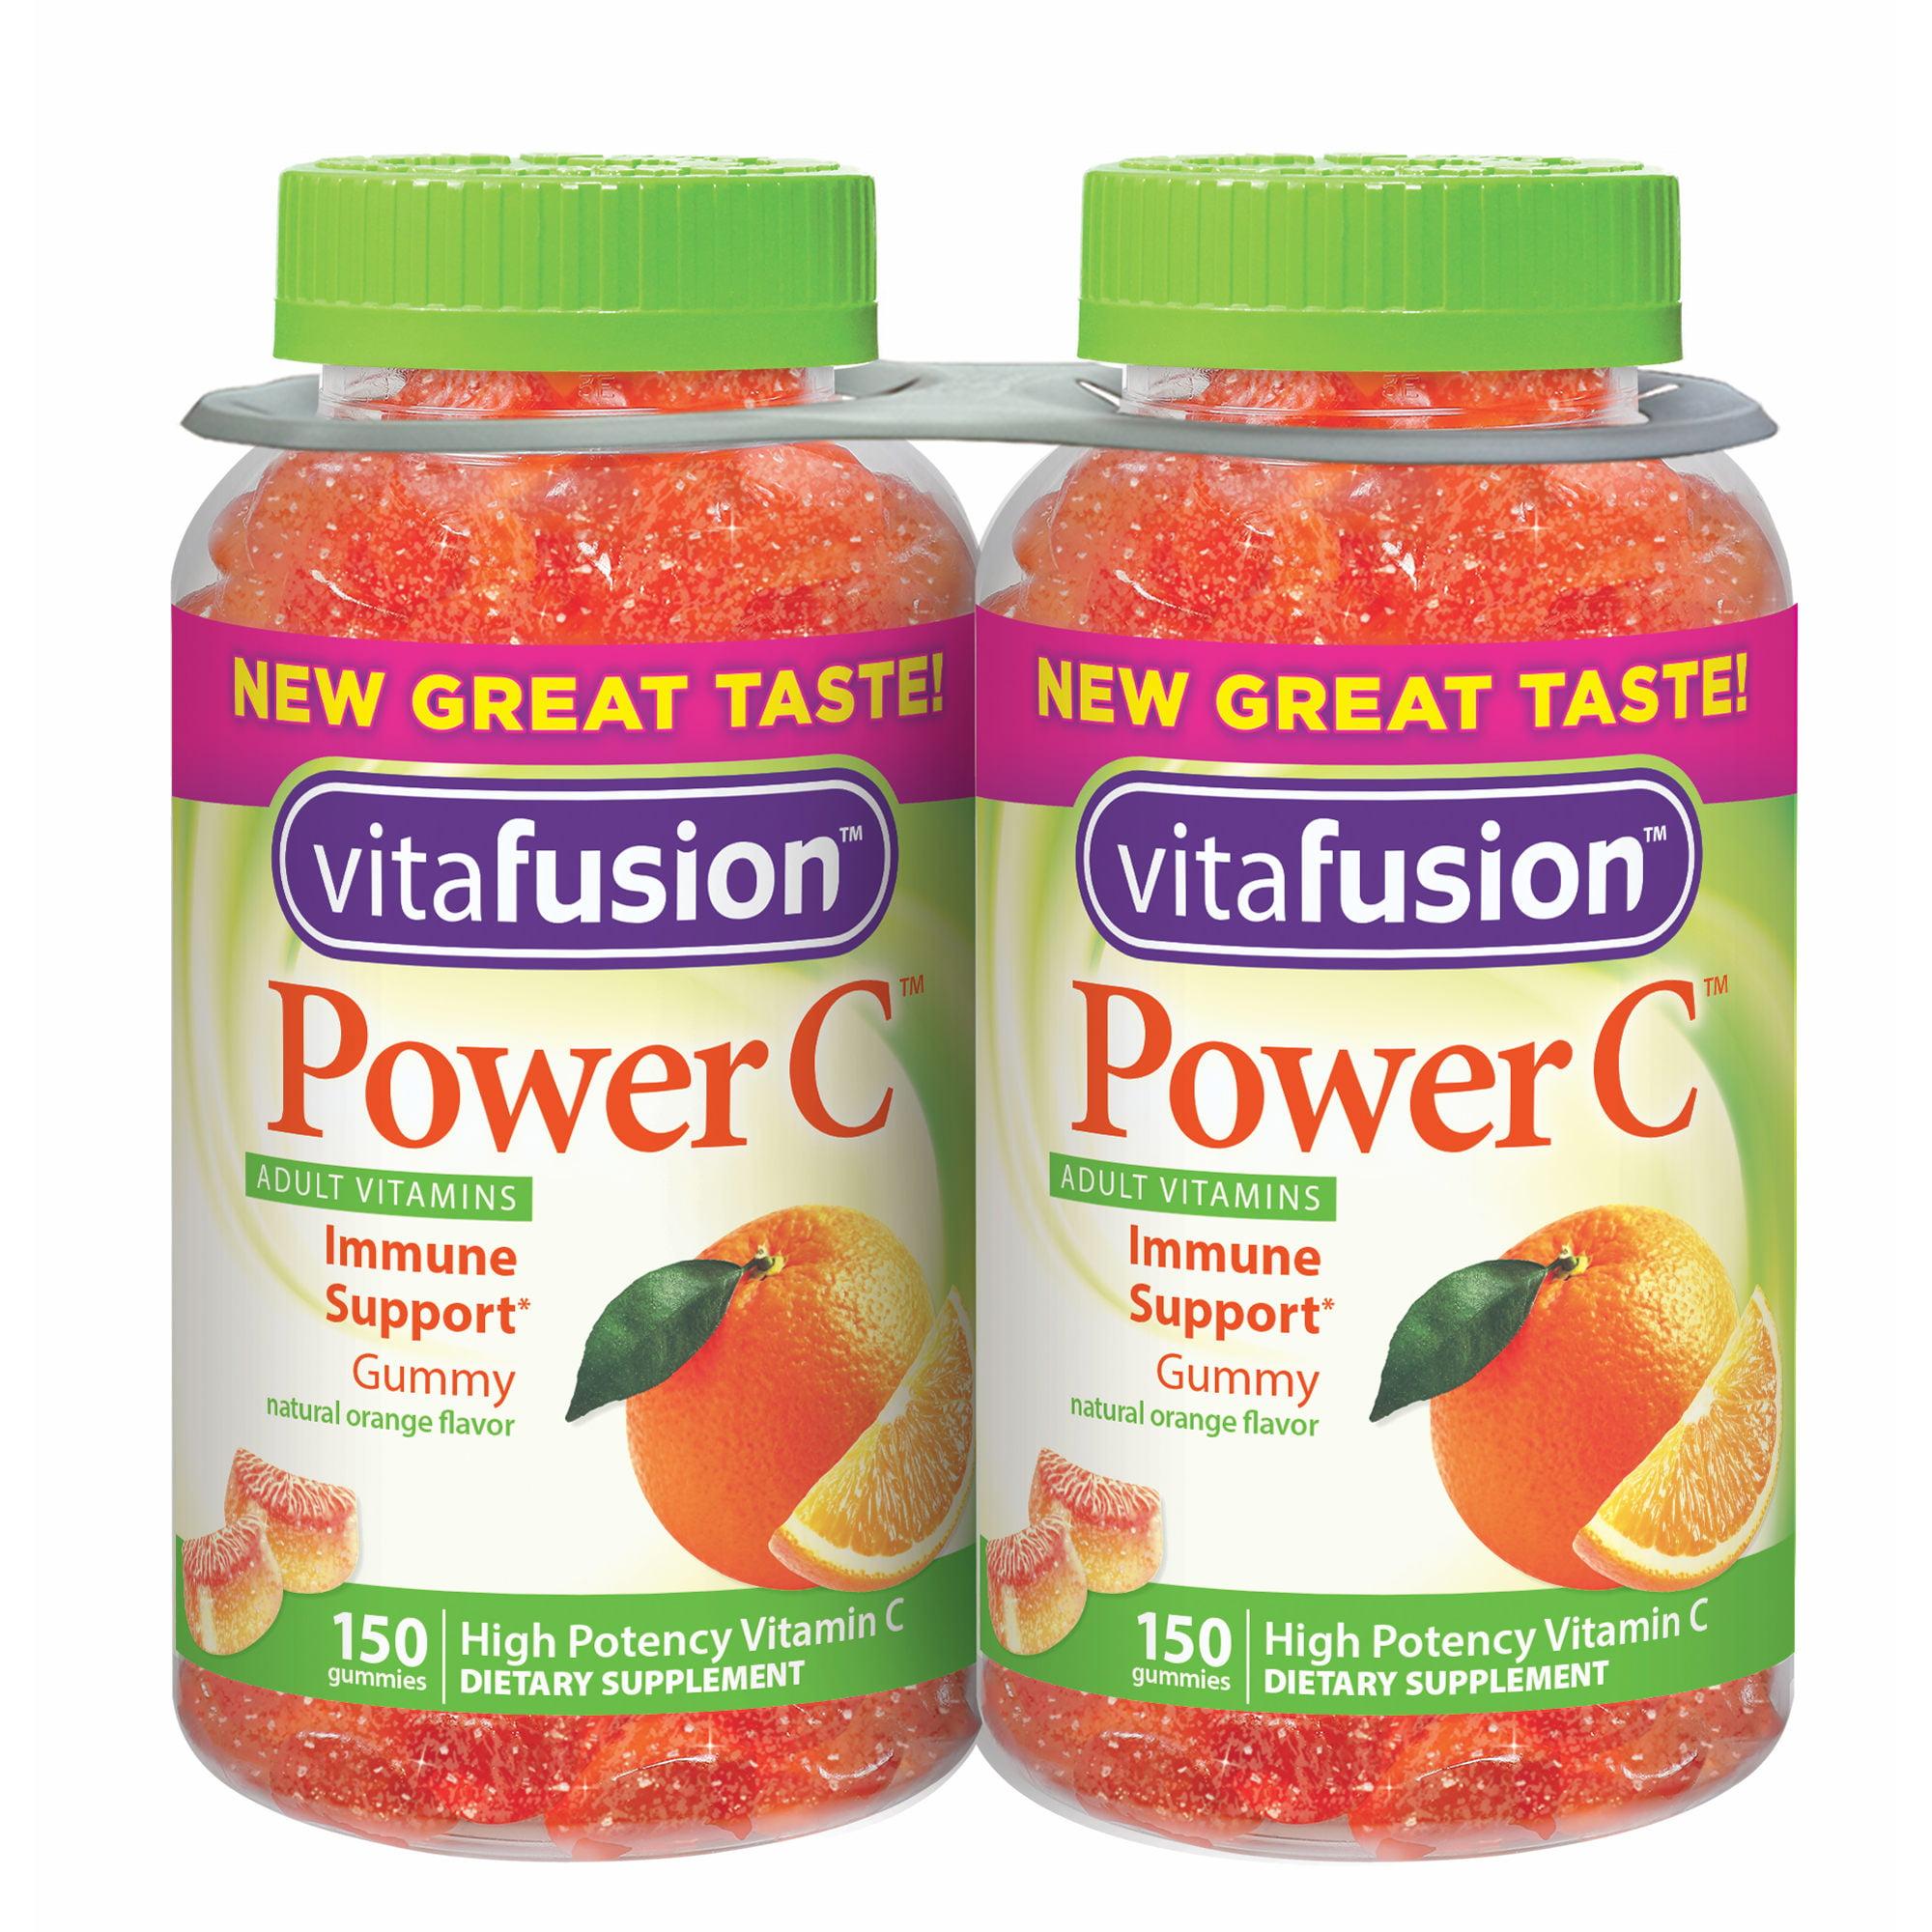 Vitafusion Power C Gummy Vitamin, 2 pk./150 ct.